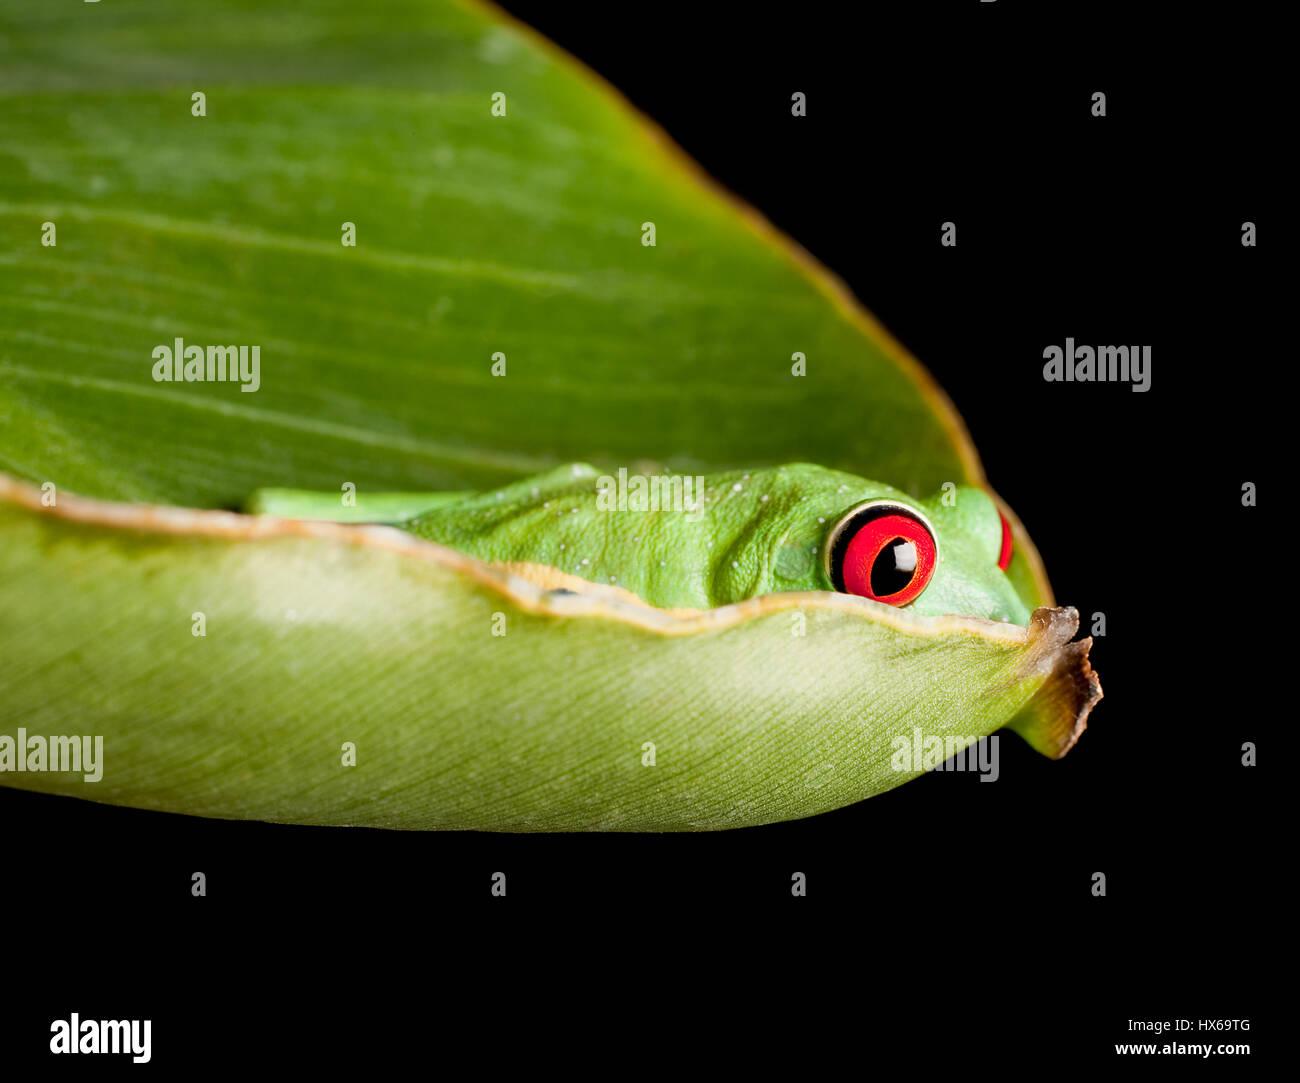 Red eyed tree frog on banana leaf Stock Photo